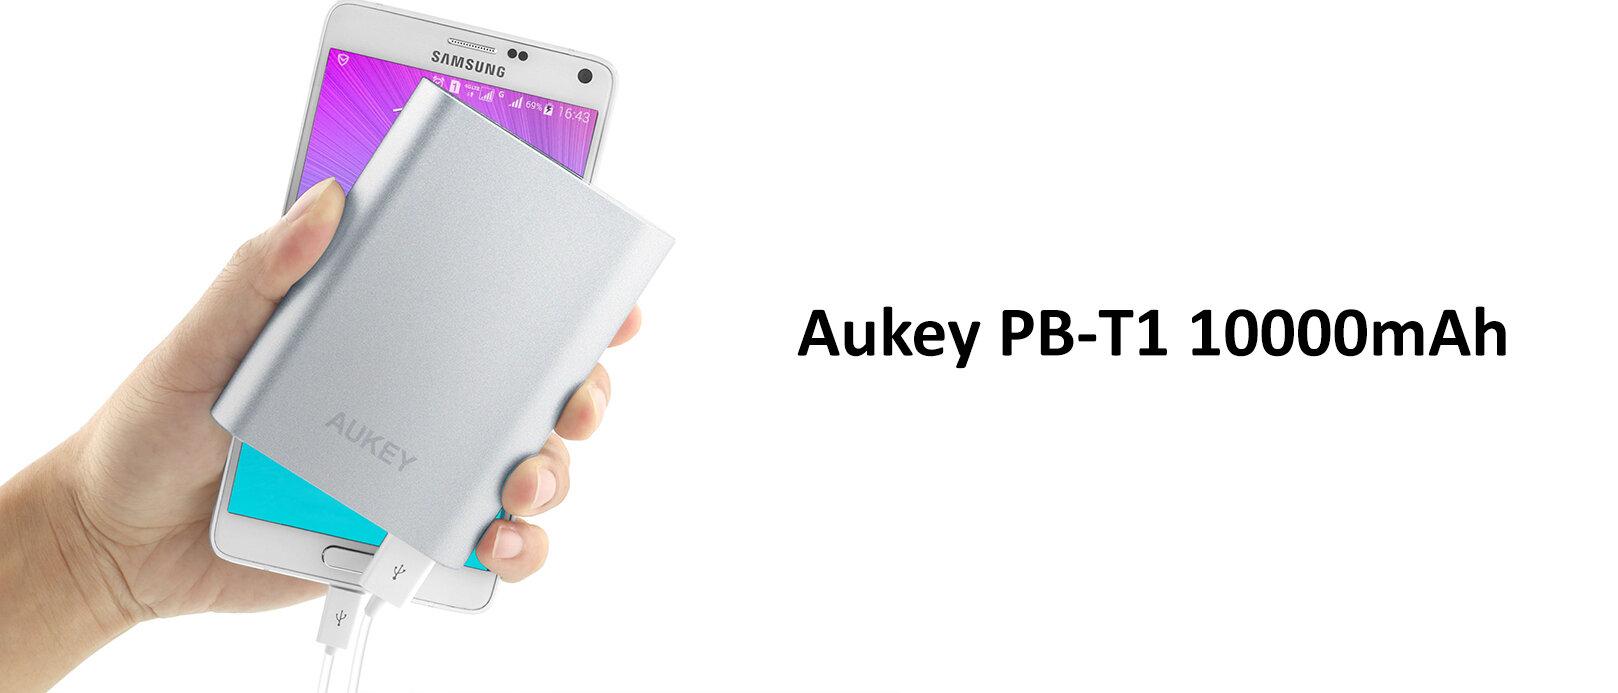 Aukey PB-T1 10000mAh